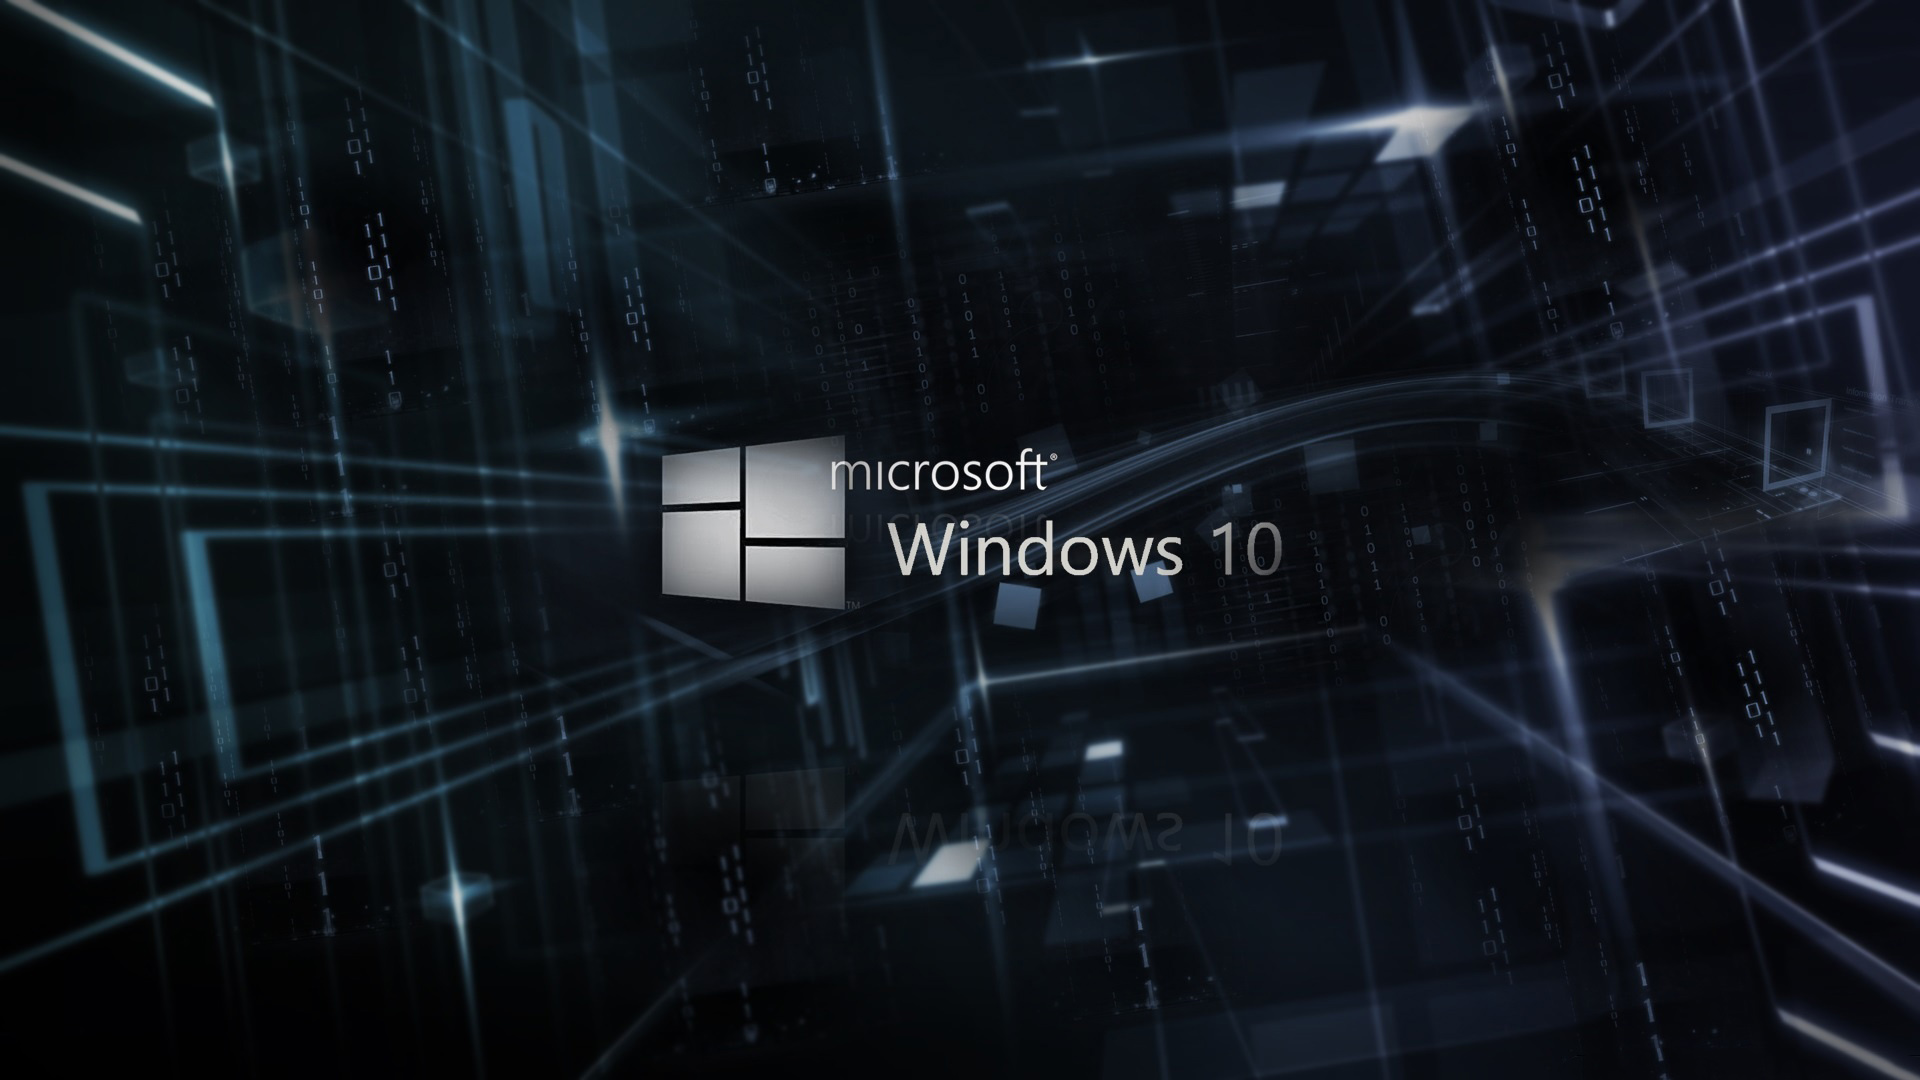 43+ Windows 10 Wallpapers HD on WallpaperSafari